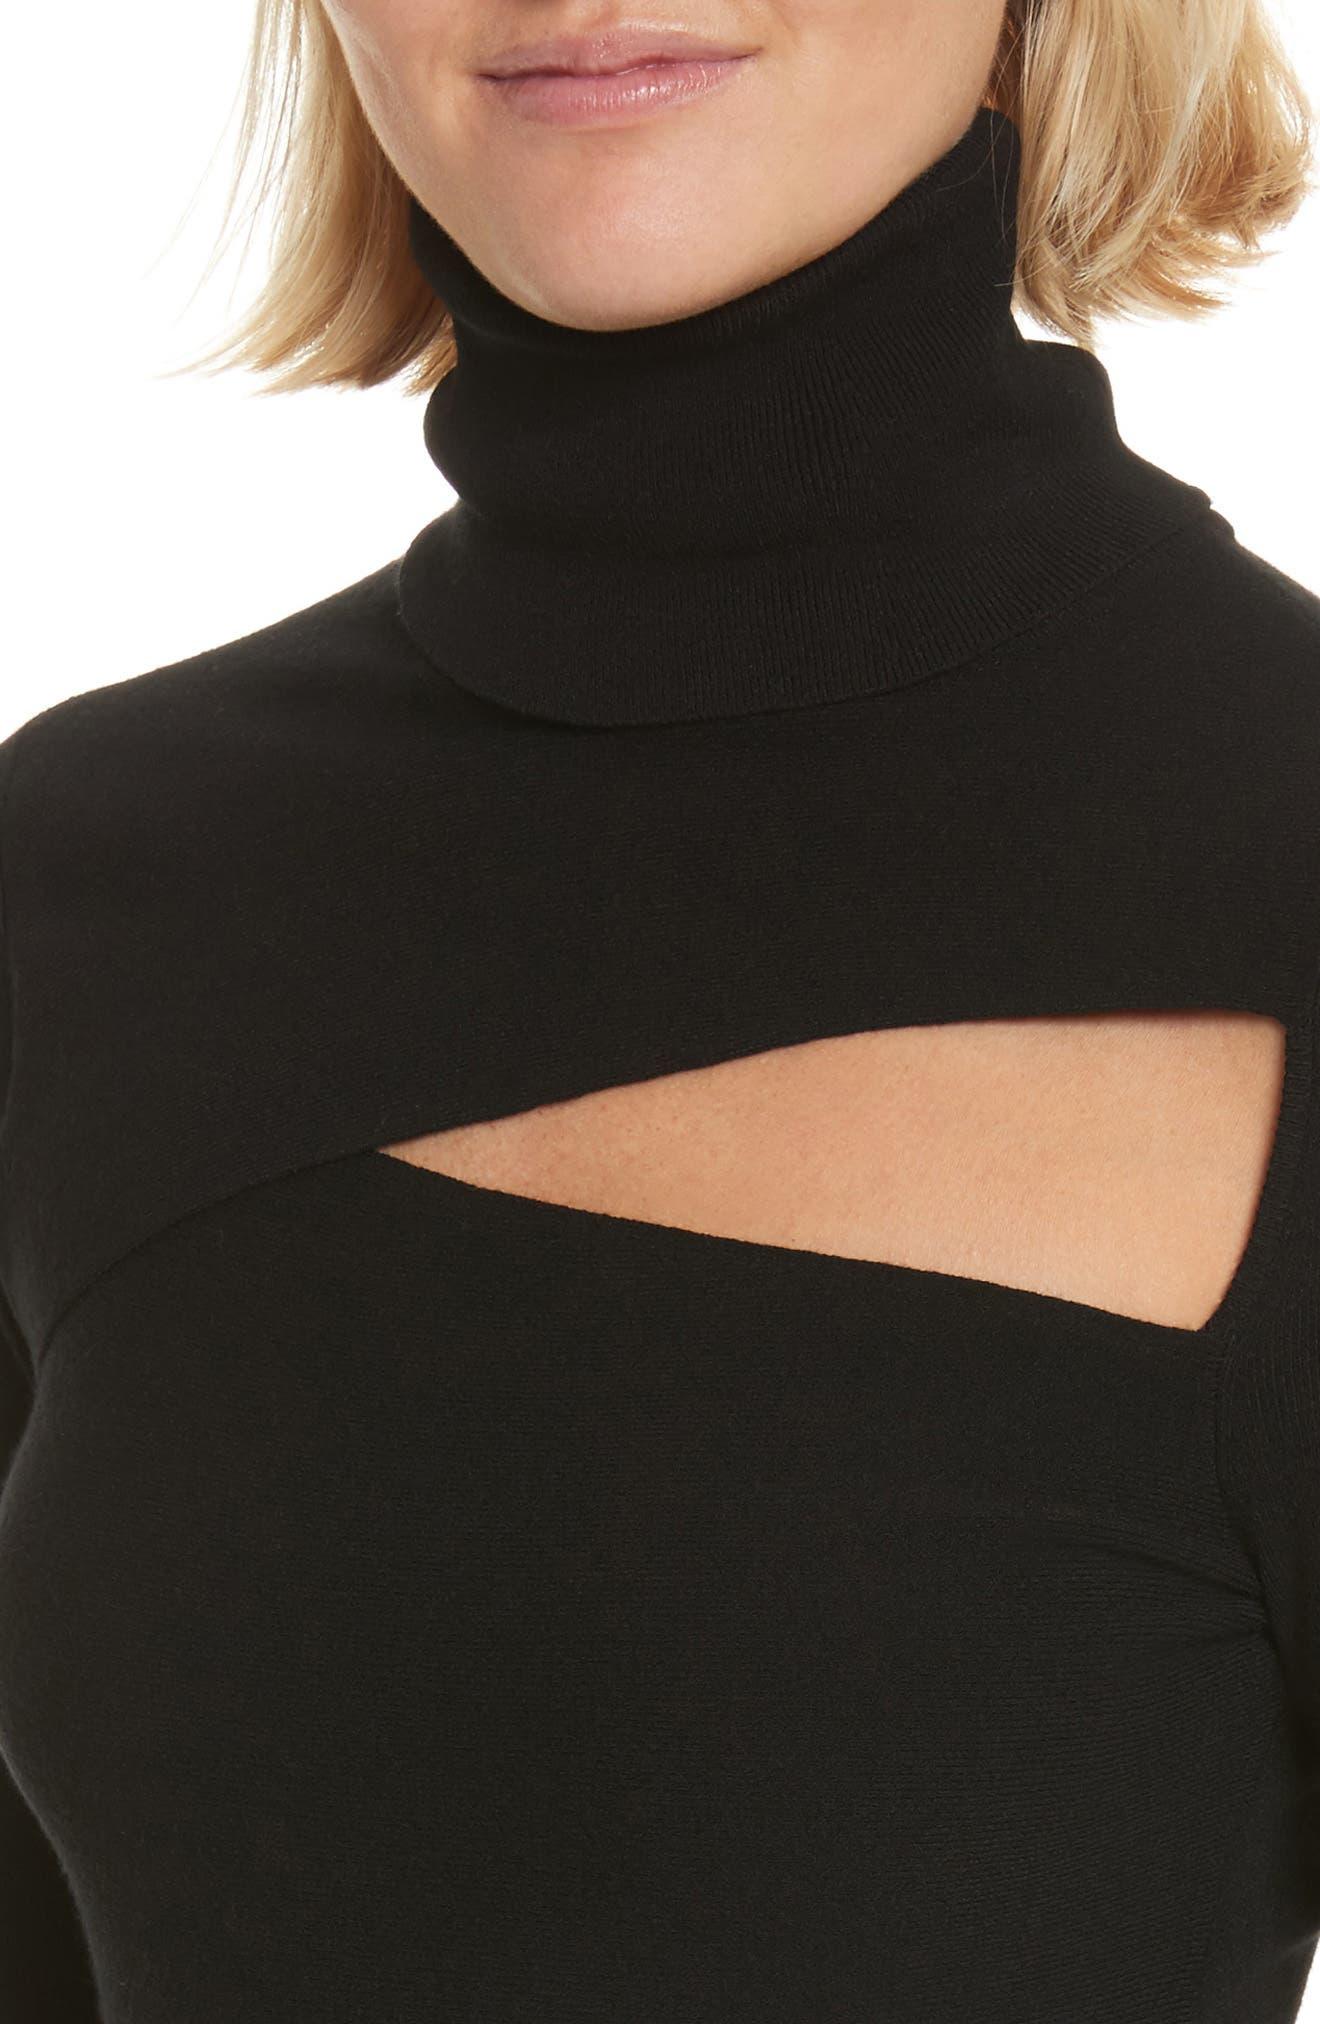 Camden Cutout Turtleneck Sweater,                             Alternate thumbnail 4, color,                             001